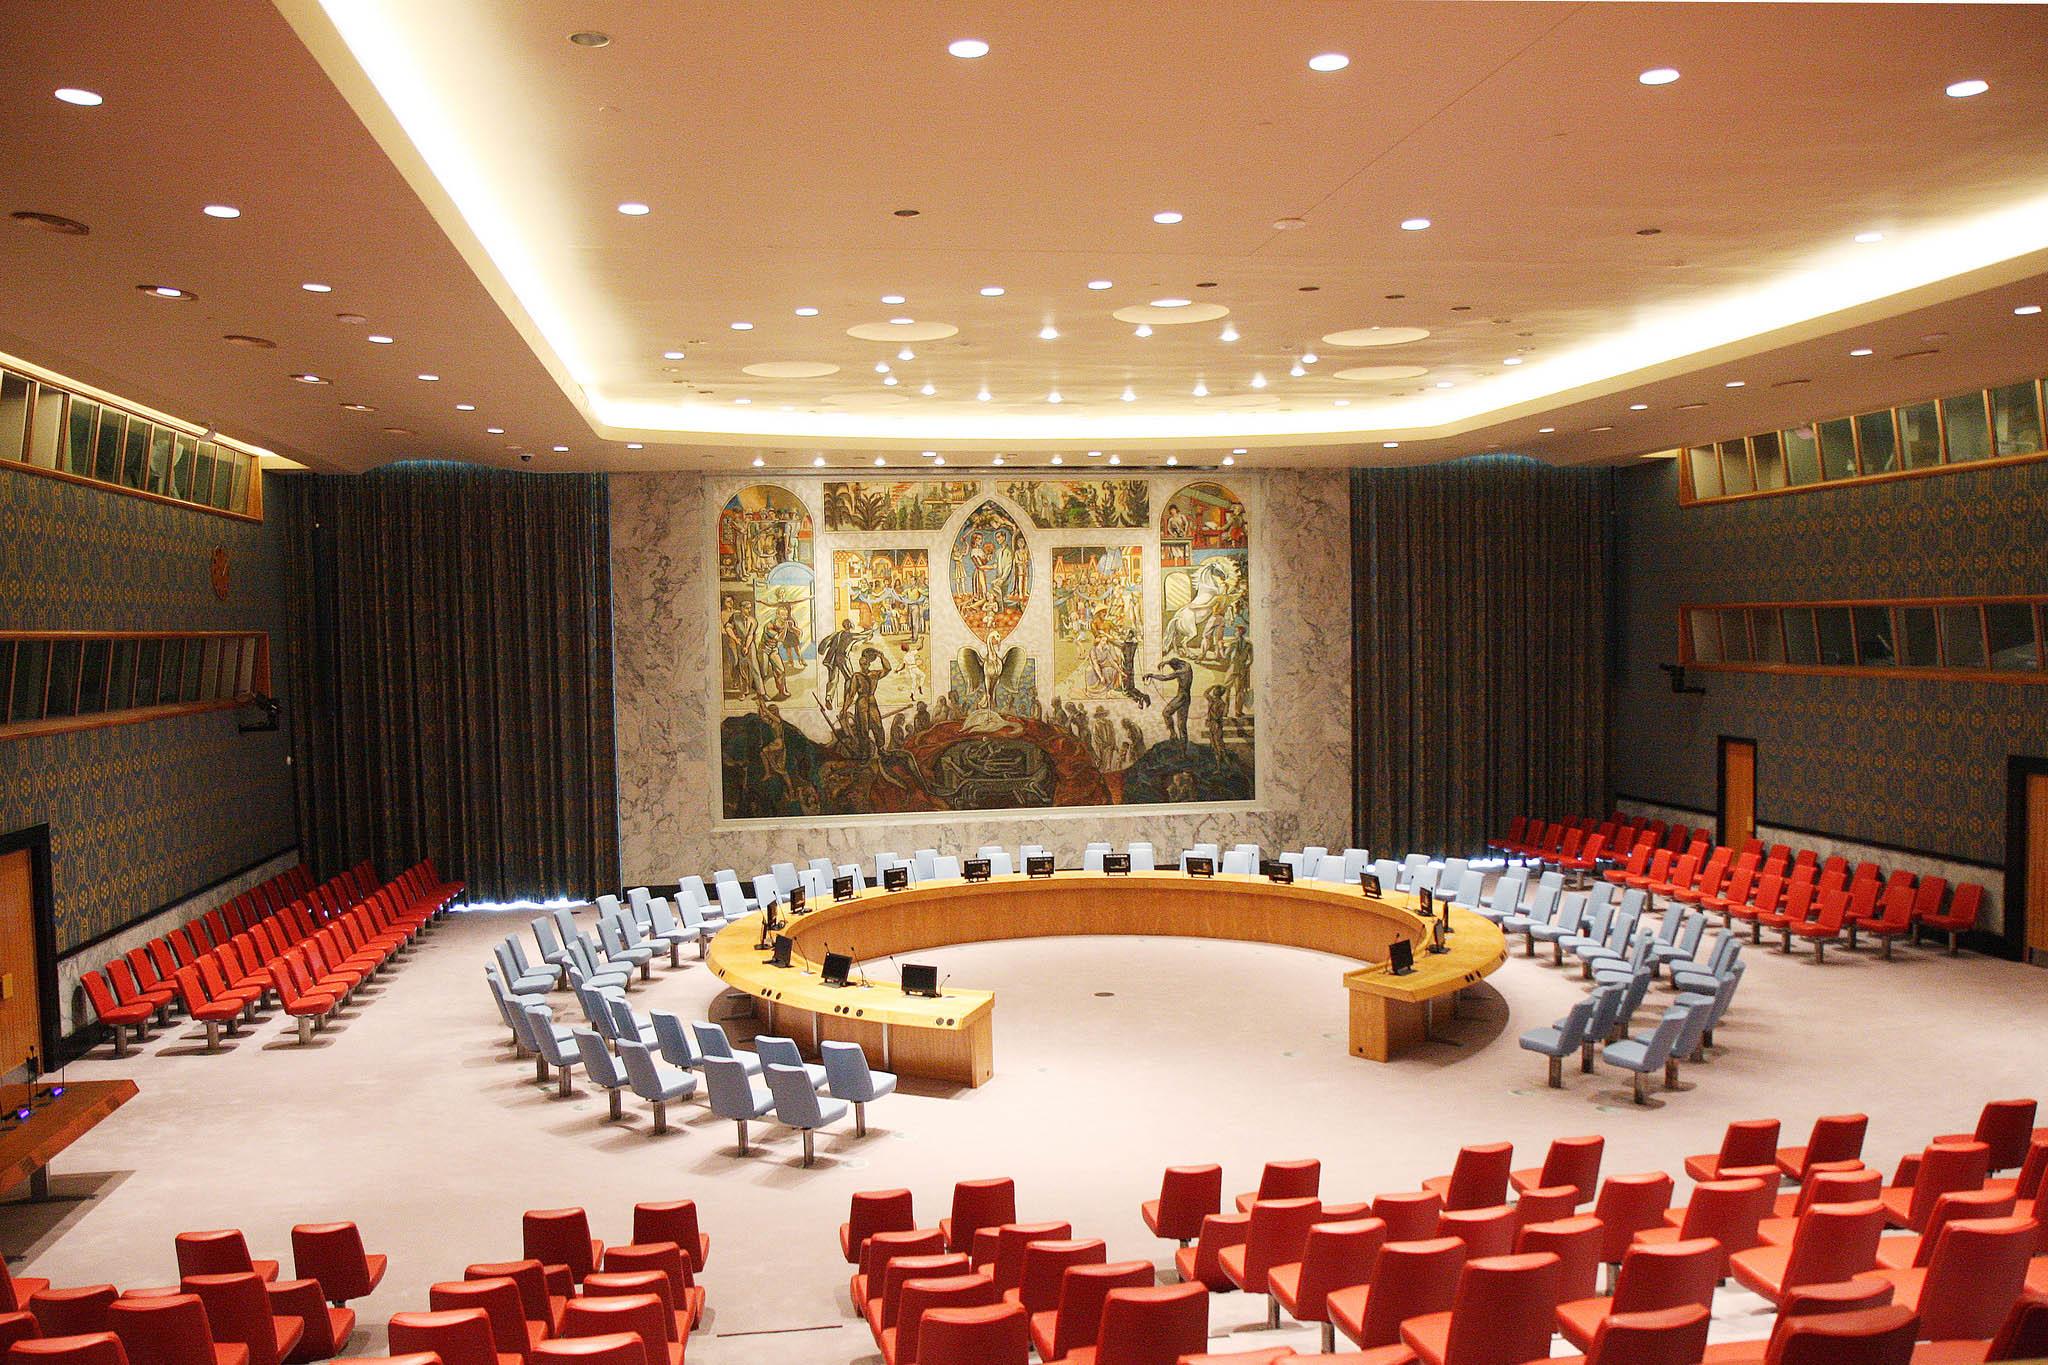 Зал заседаний Совета Безопасности ООН фото 2